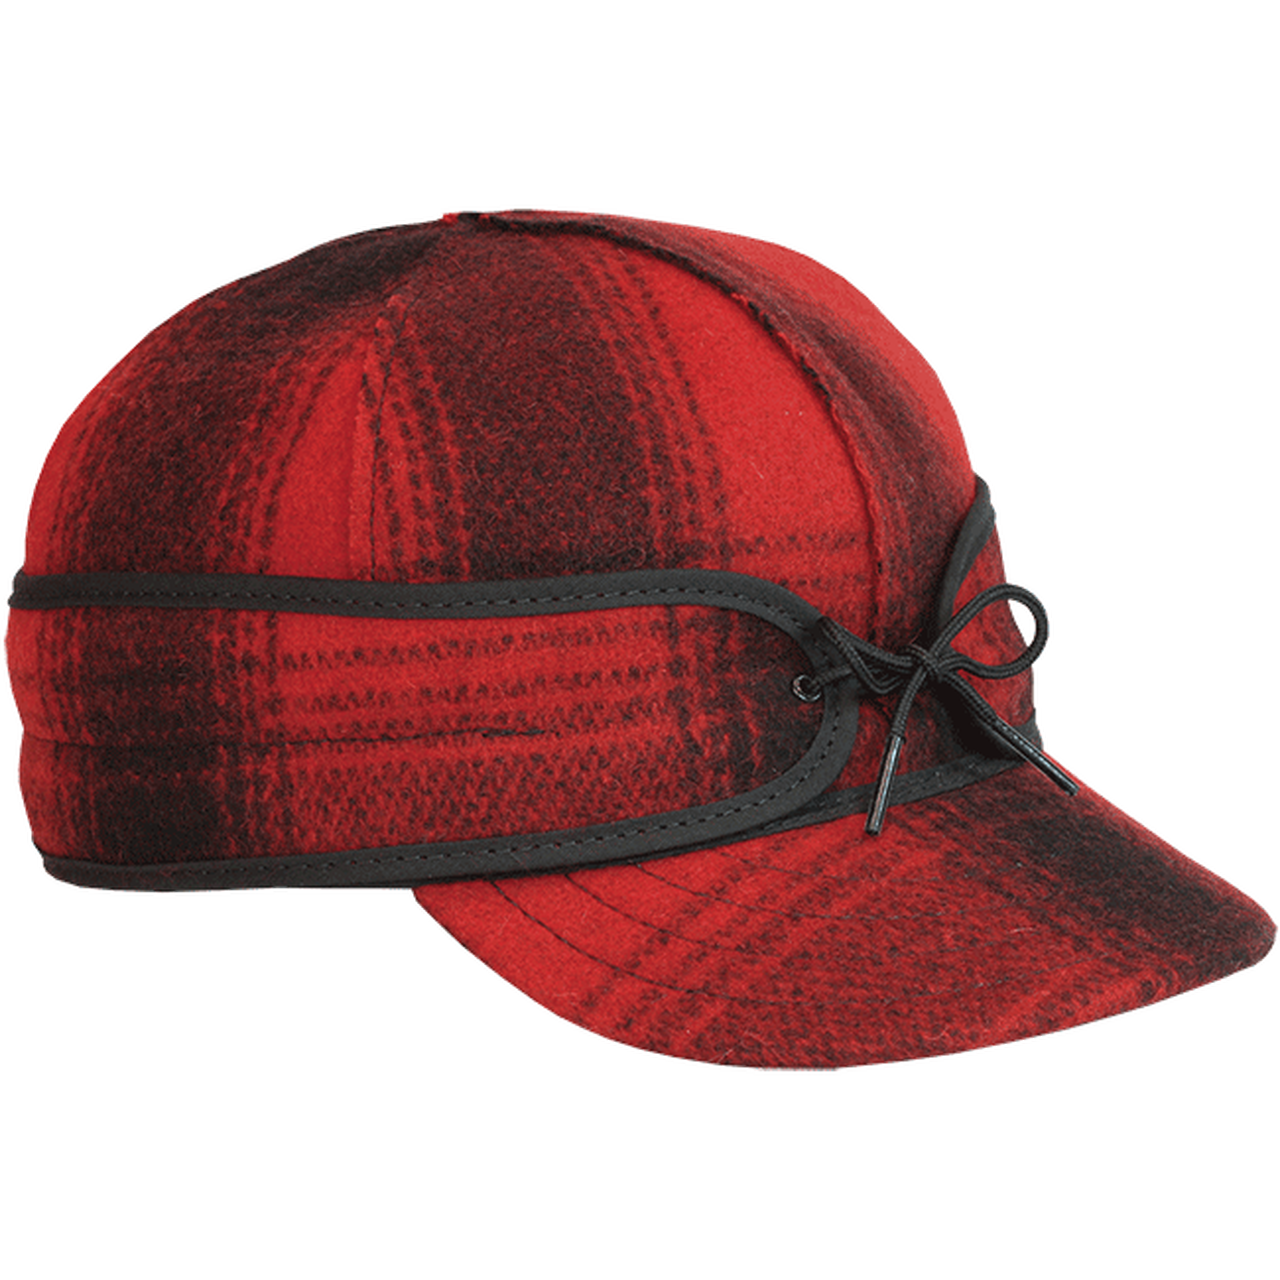 Stormy Kromer Original Kromer Cap Winter Wool Hat with Earflap